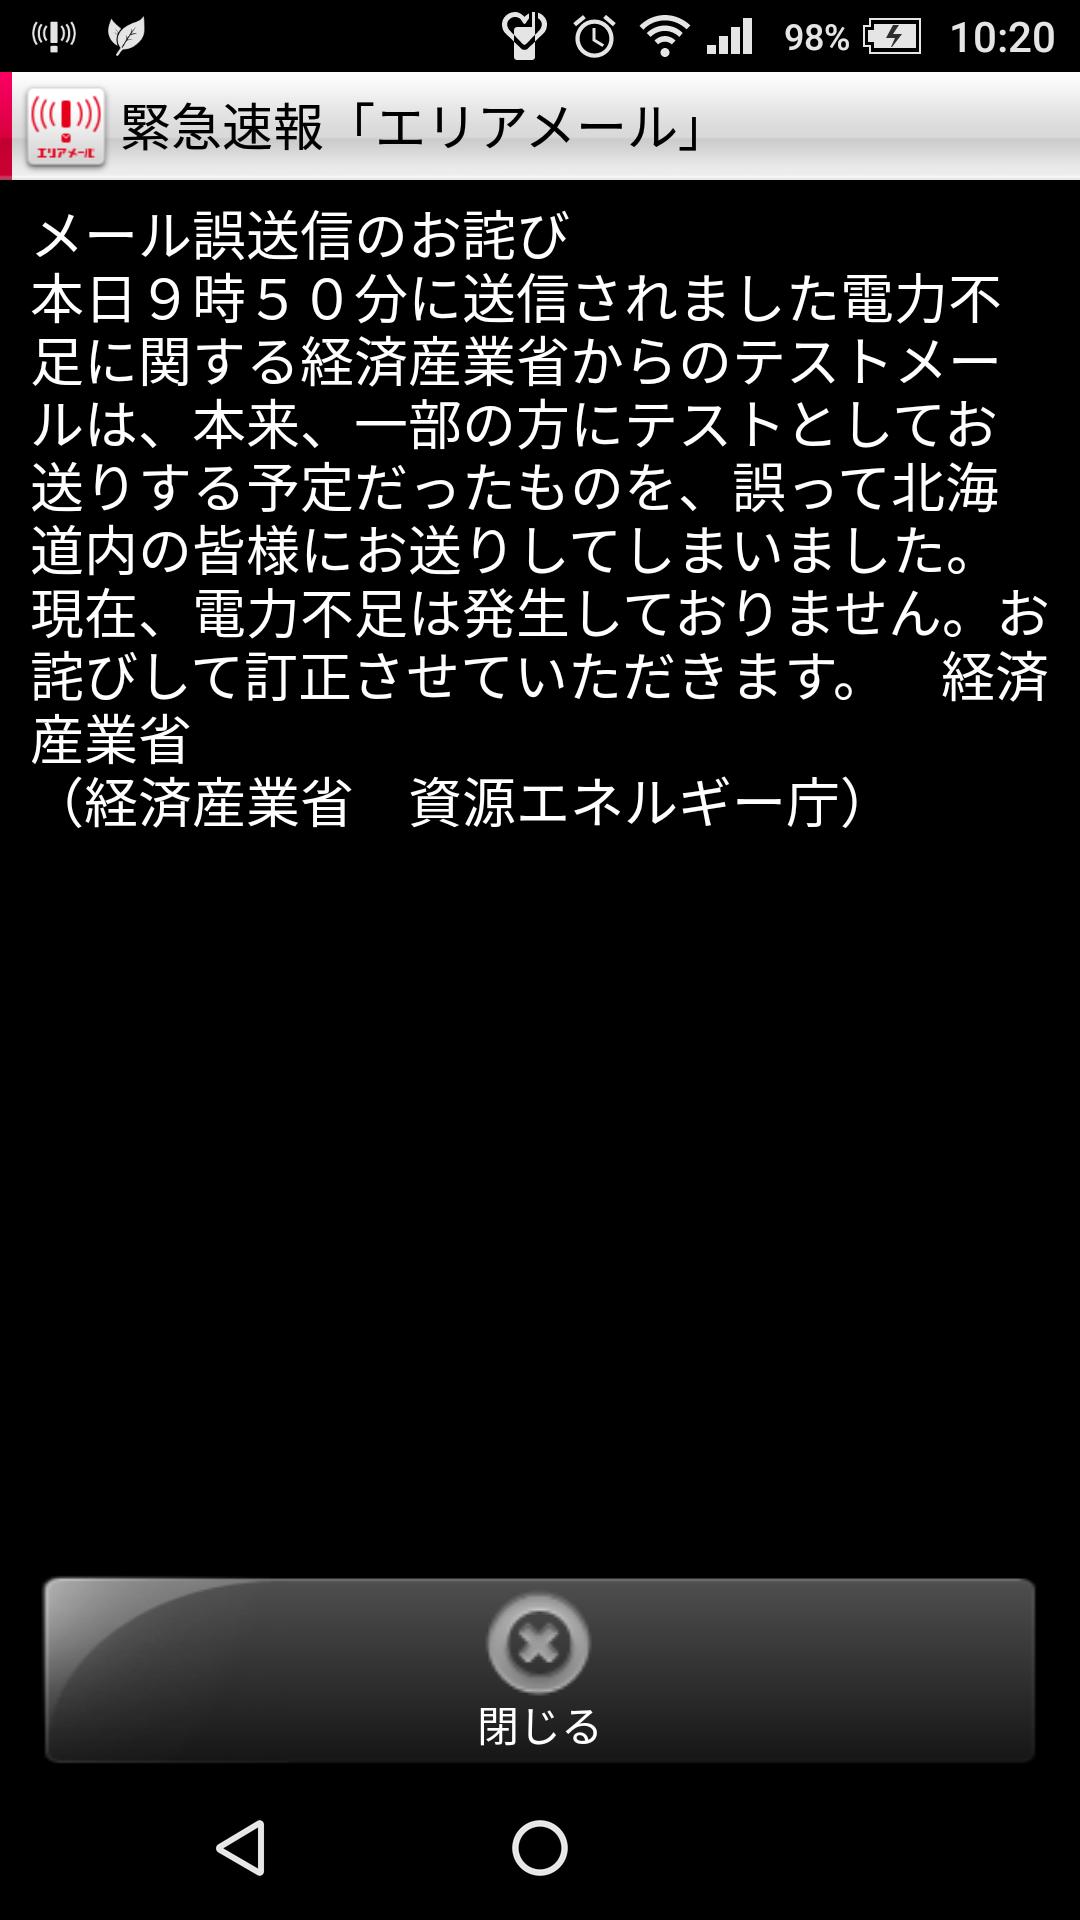 Screenshot_20170809-102003.png